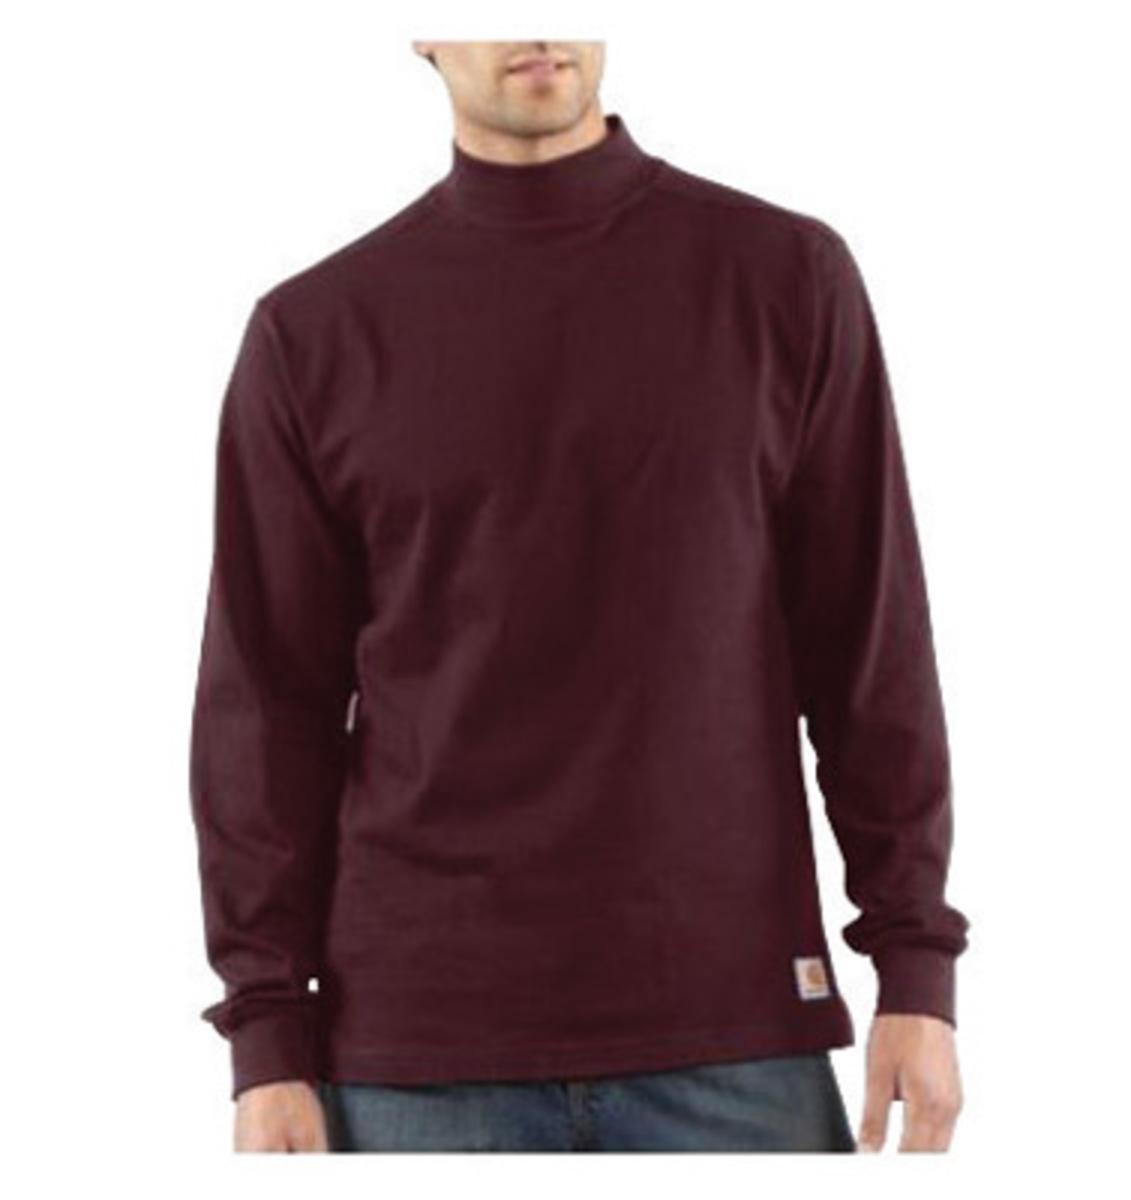 Airgas crhk203ptxltl carhartt x large tall port 7 8 for Big and tall mock turtleneck shirt